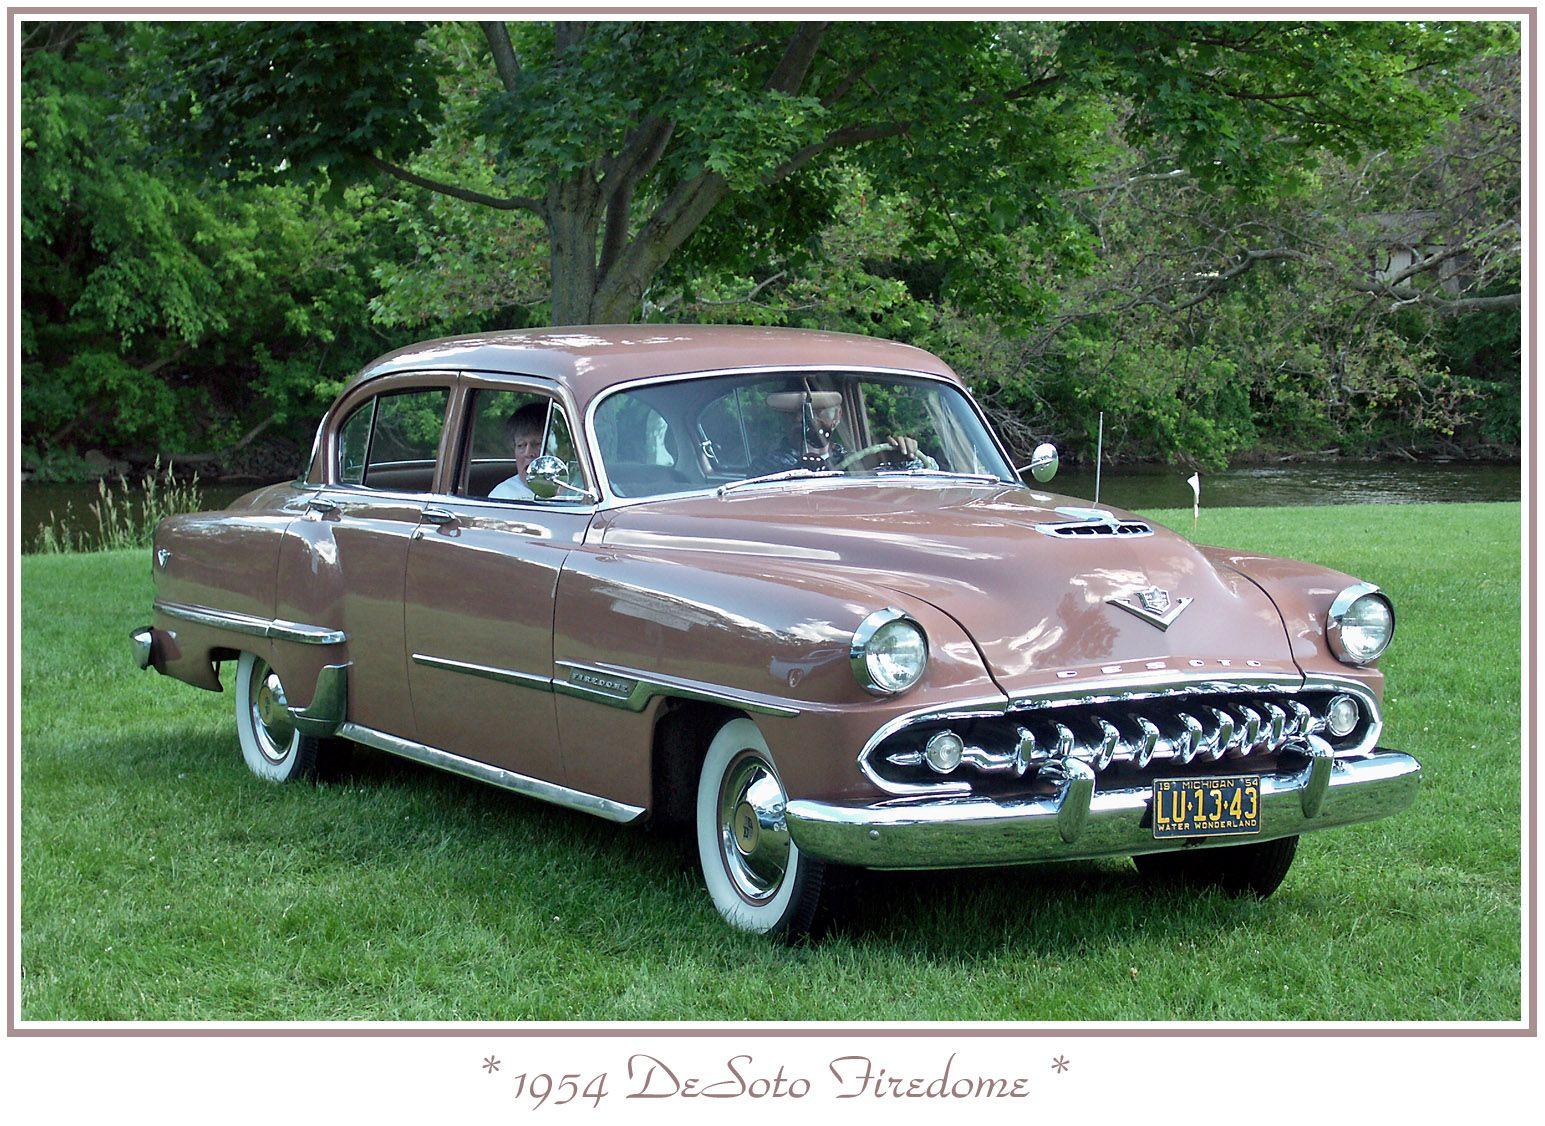 1954 DeSoto Firedome 4Door Sedan Desoto cars, Desoto